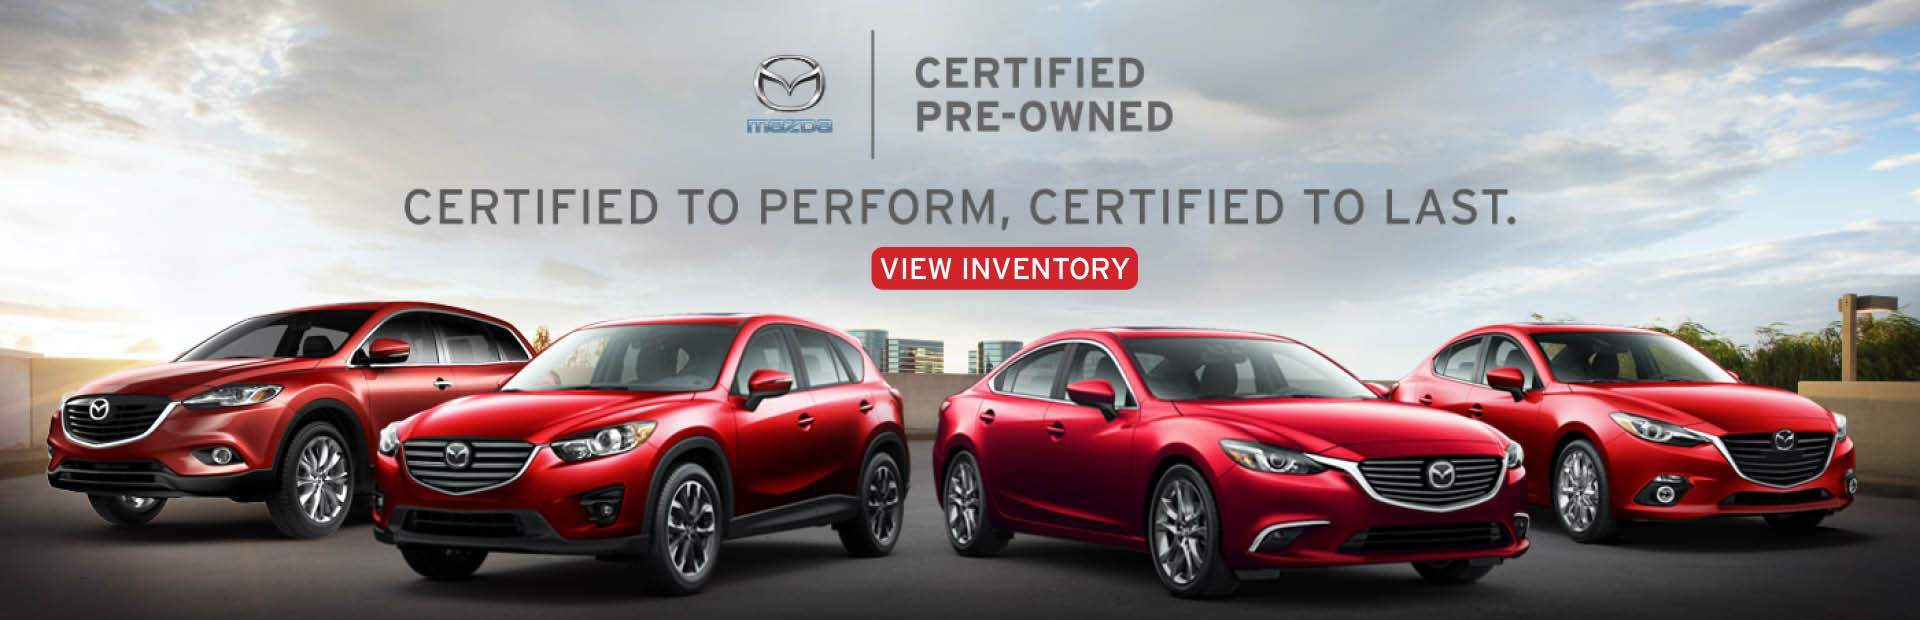 Hall Mazda Mazda Dealership And Used Cars In Brookfield Wi